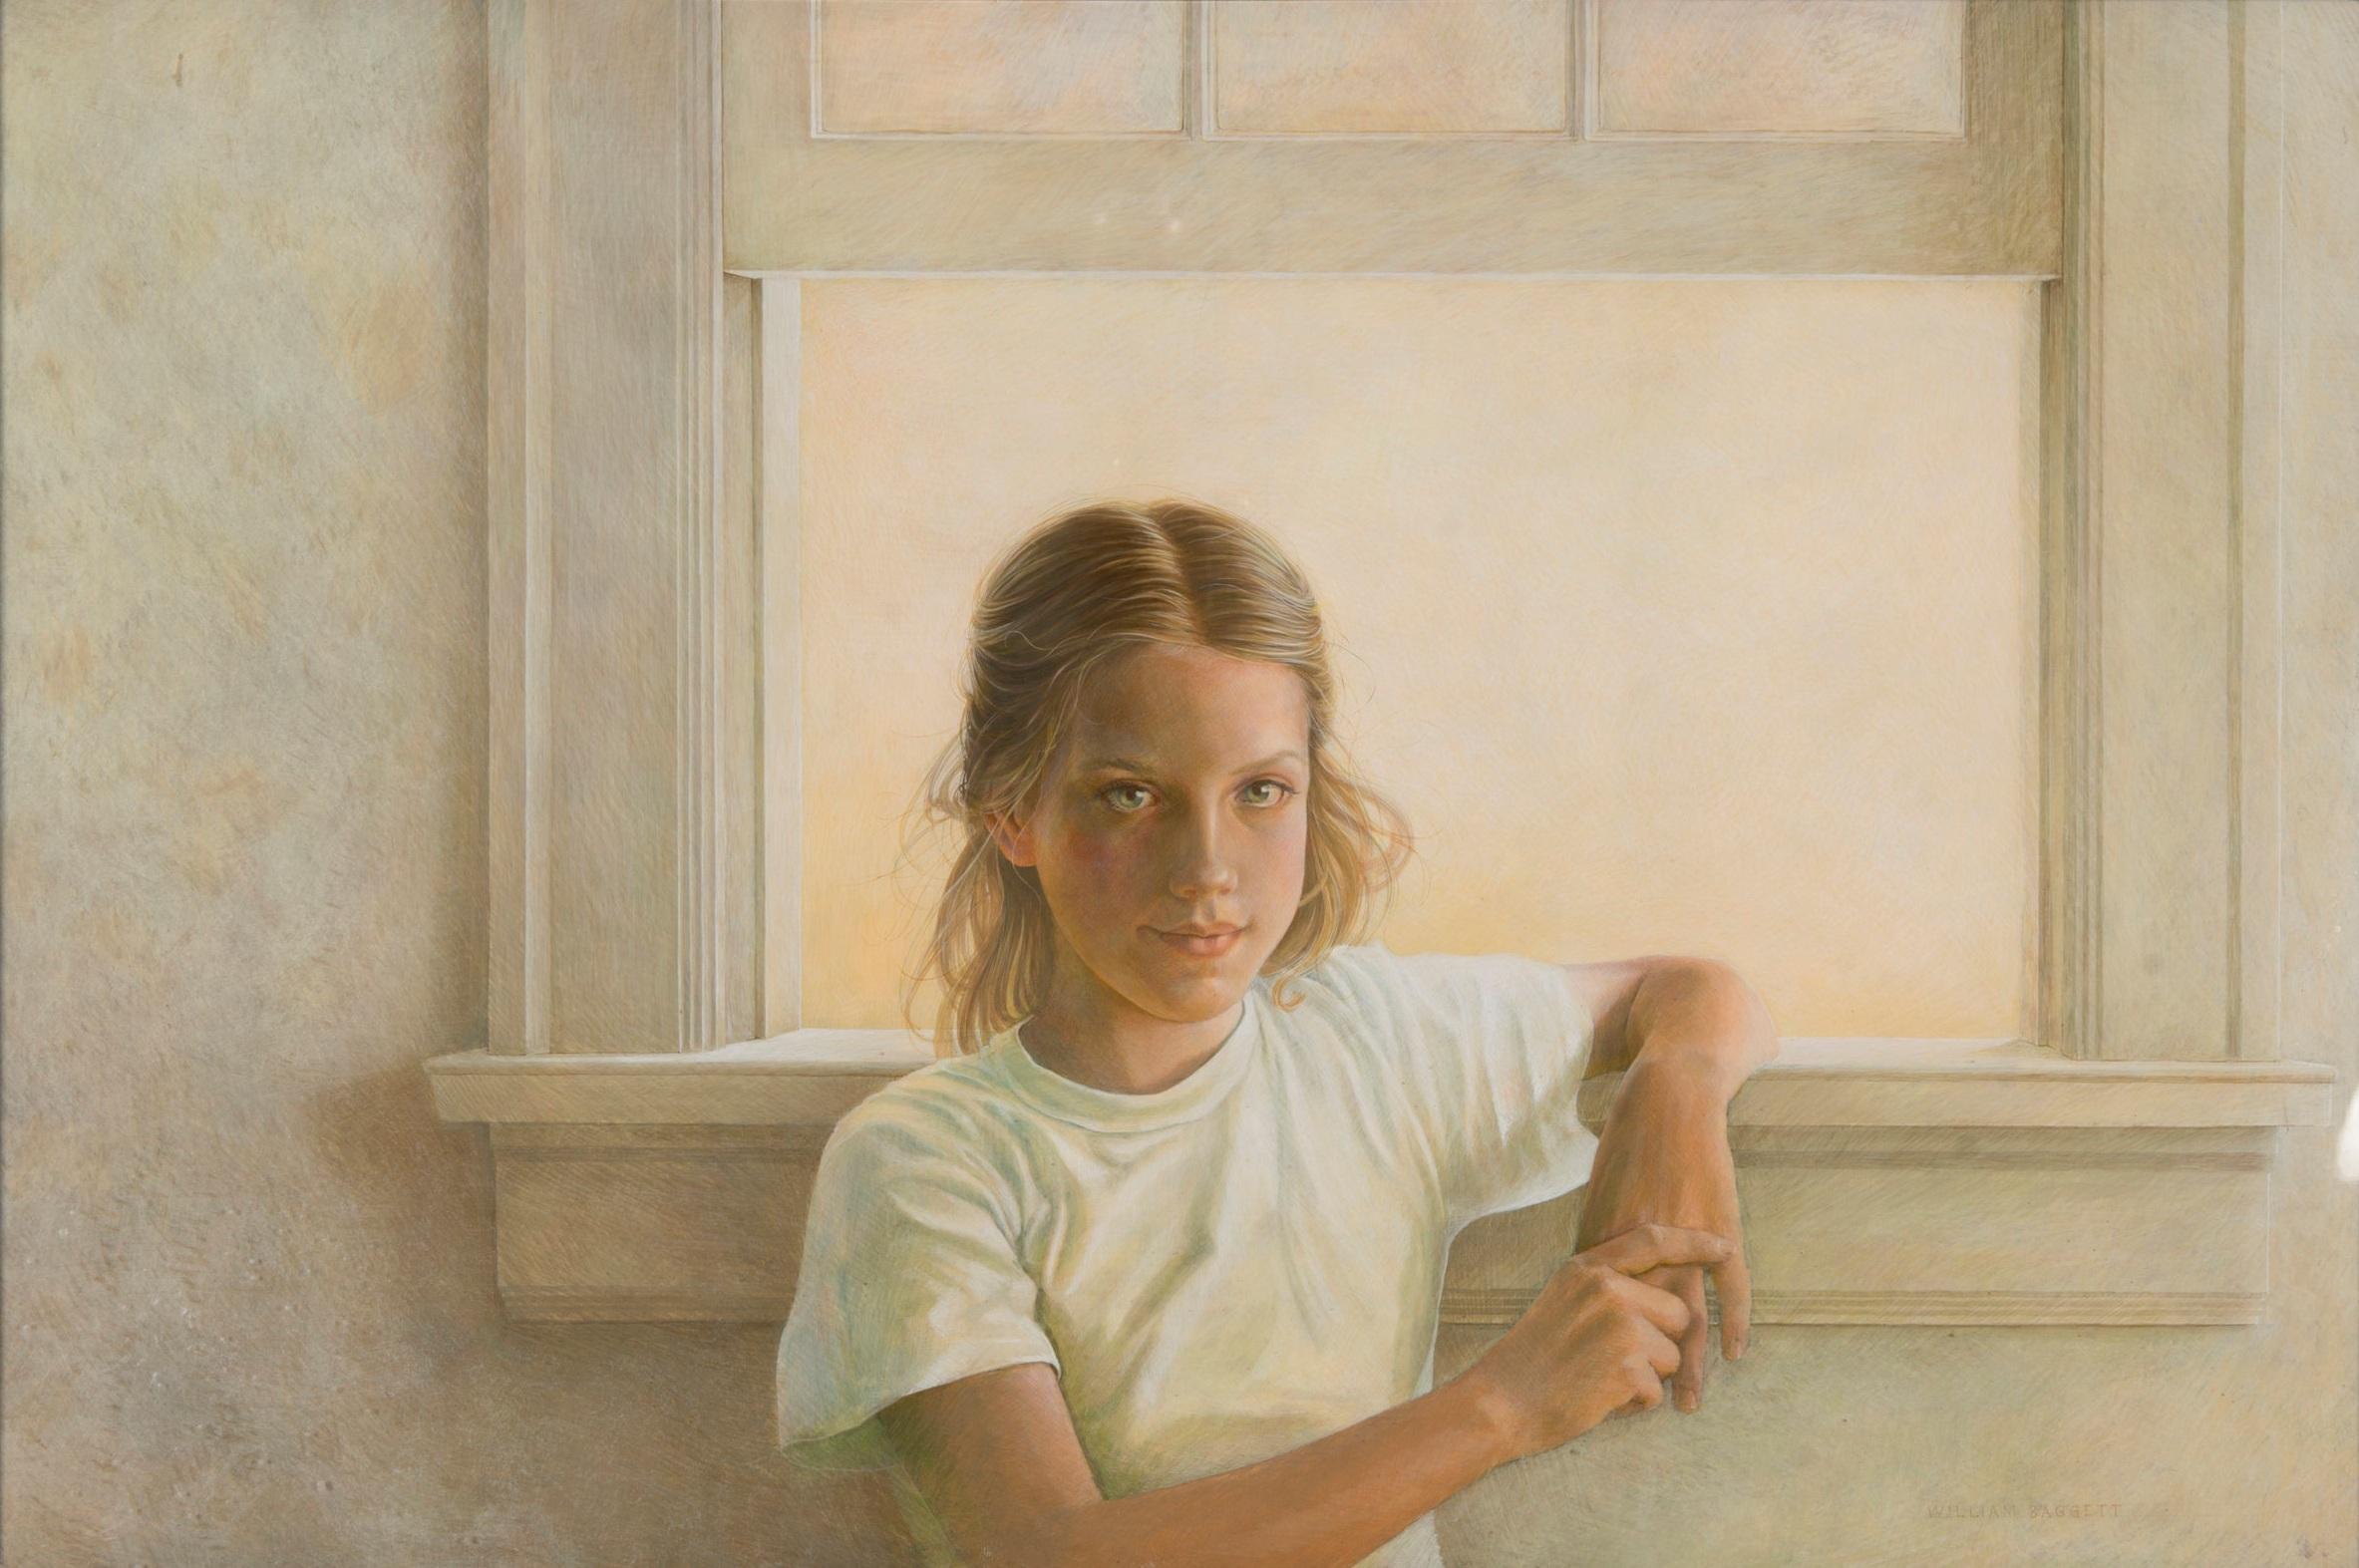 Baggett_Portrait-of-Jennifer.jpg